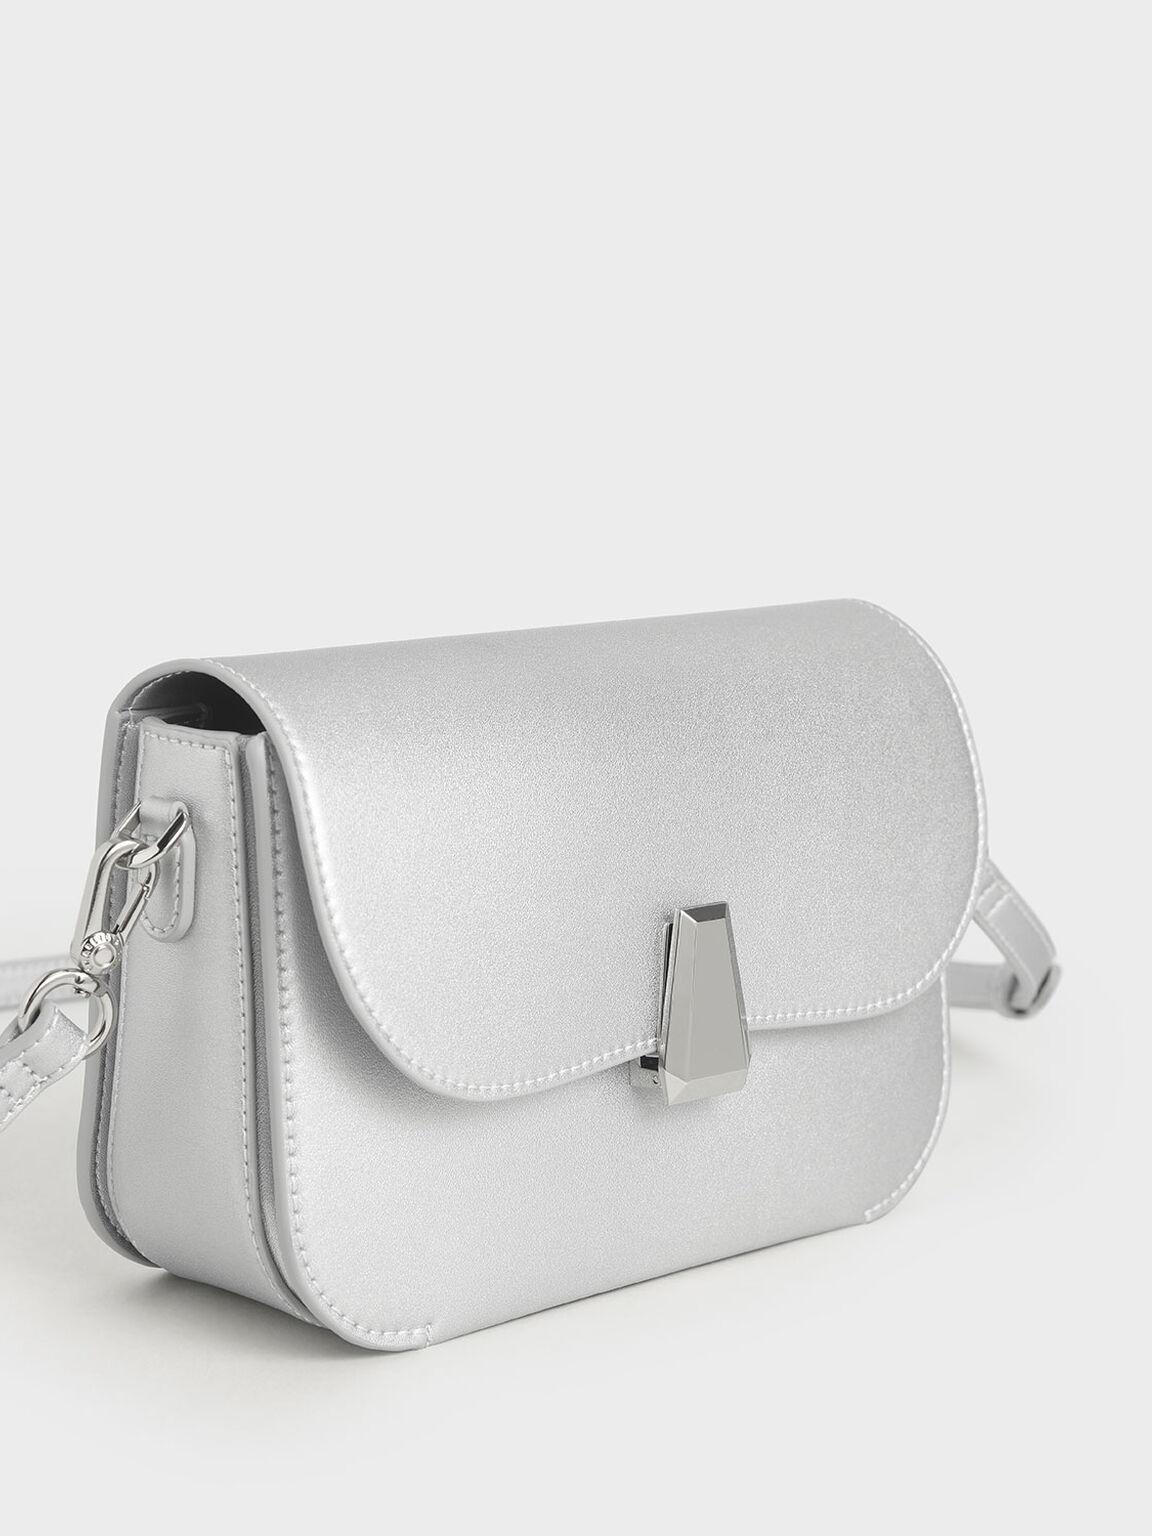 Geometric Accent Evening Bag, Silver, hi-res